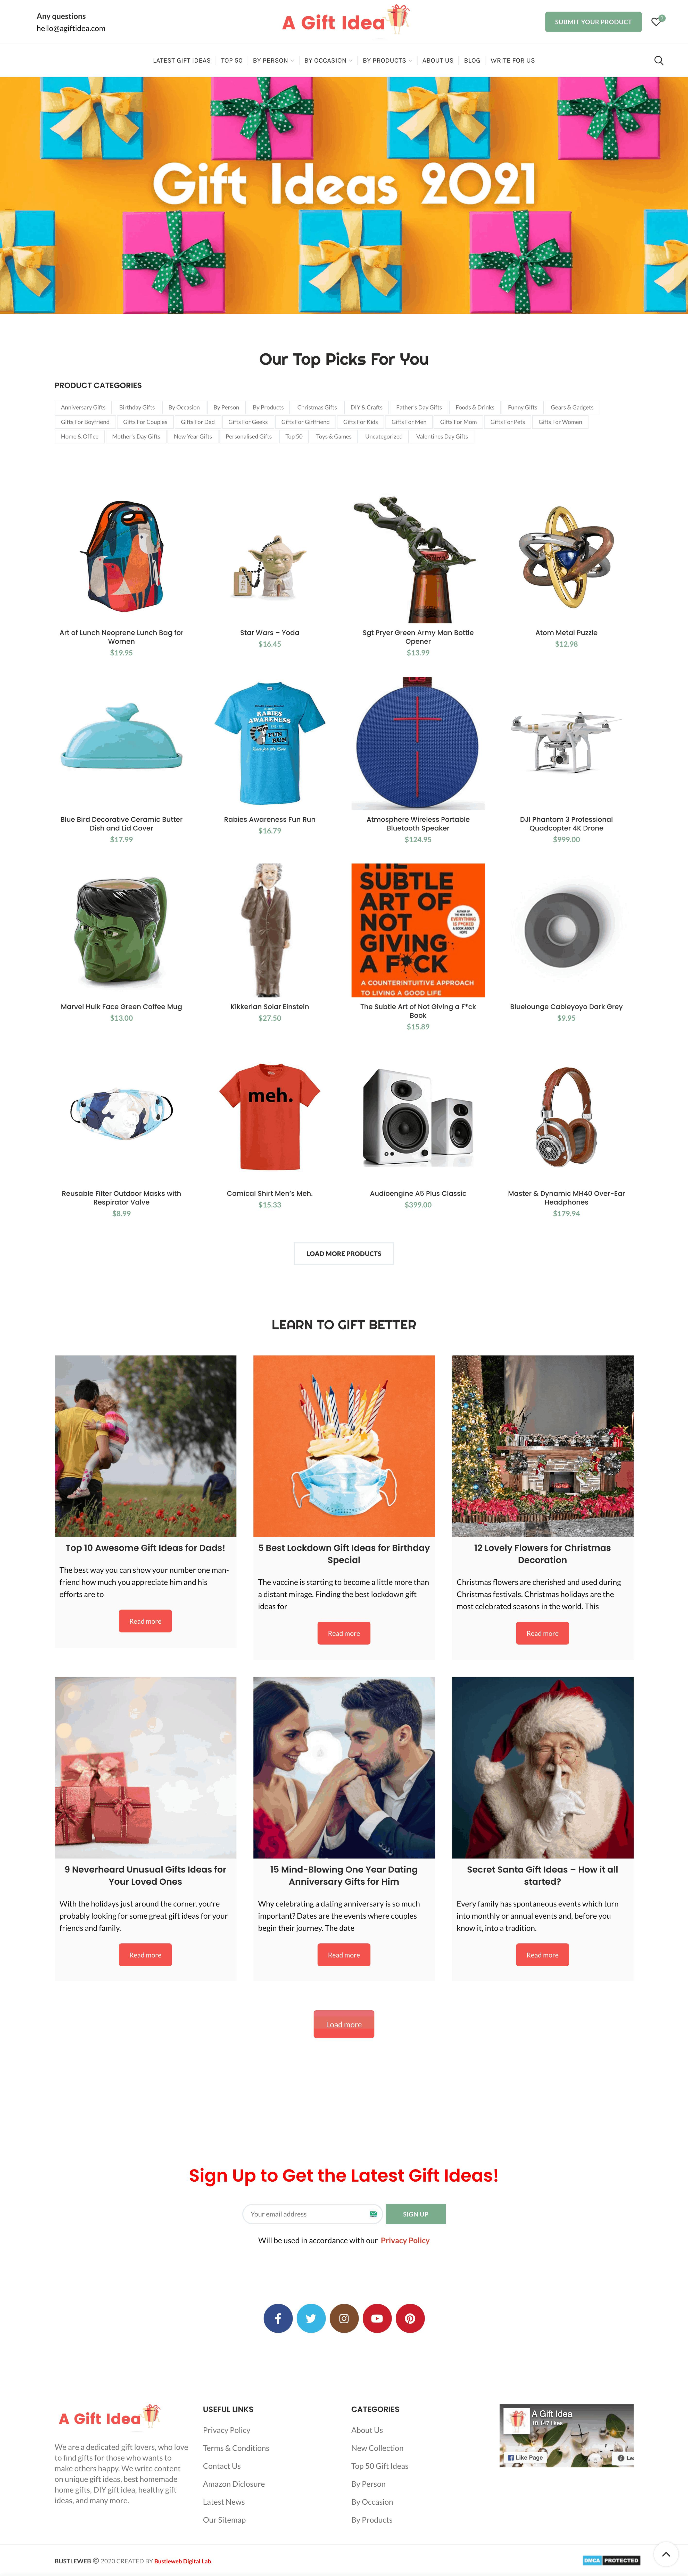 agiftidea.com design